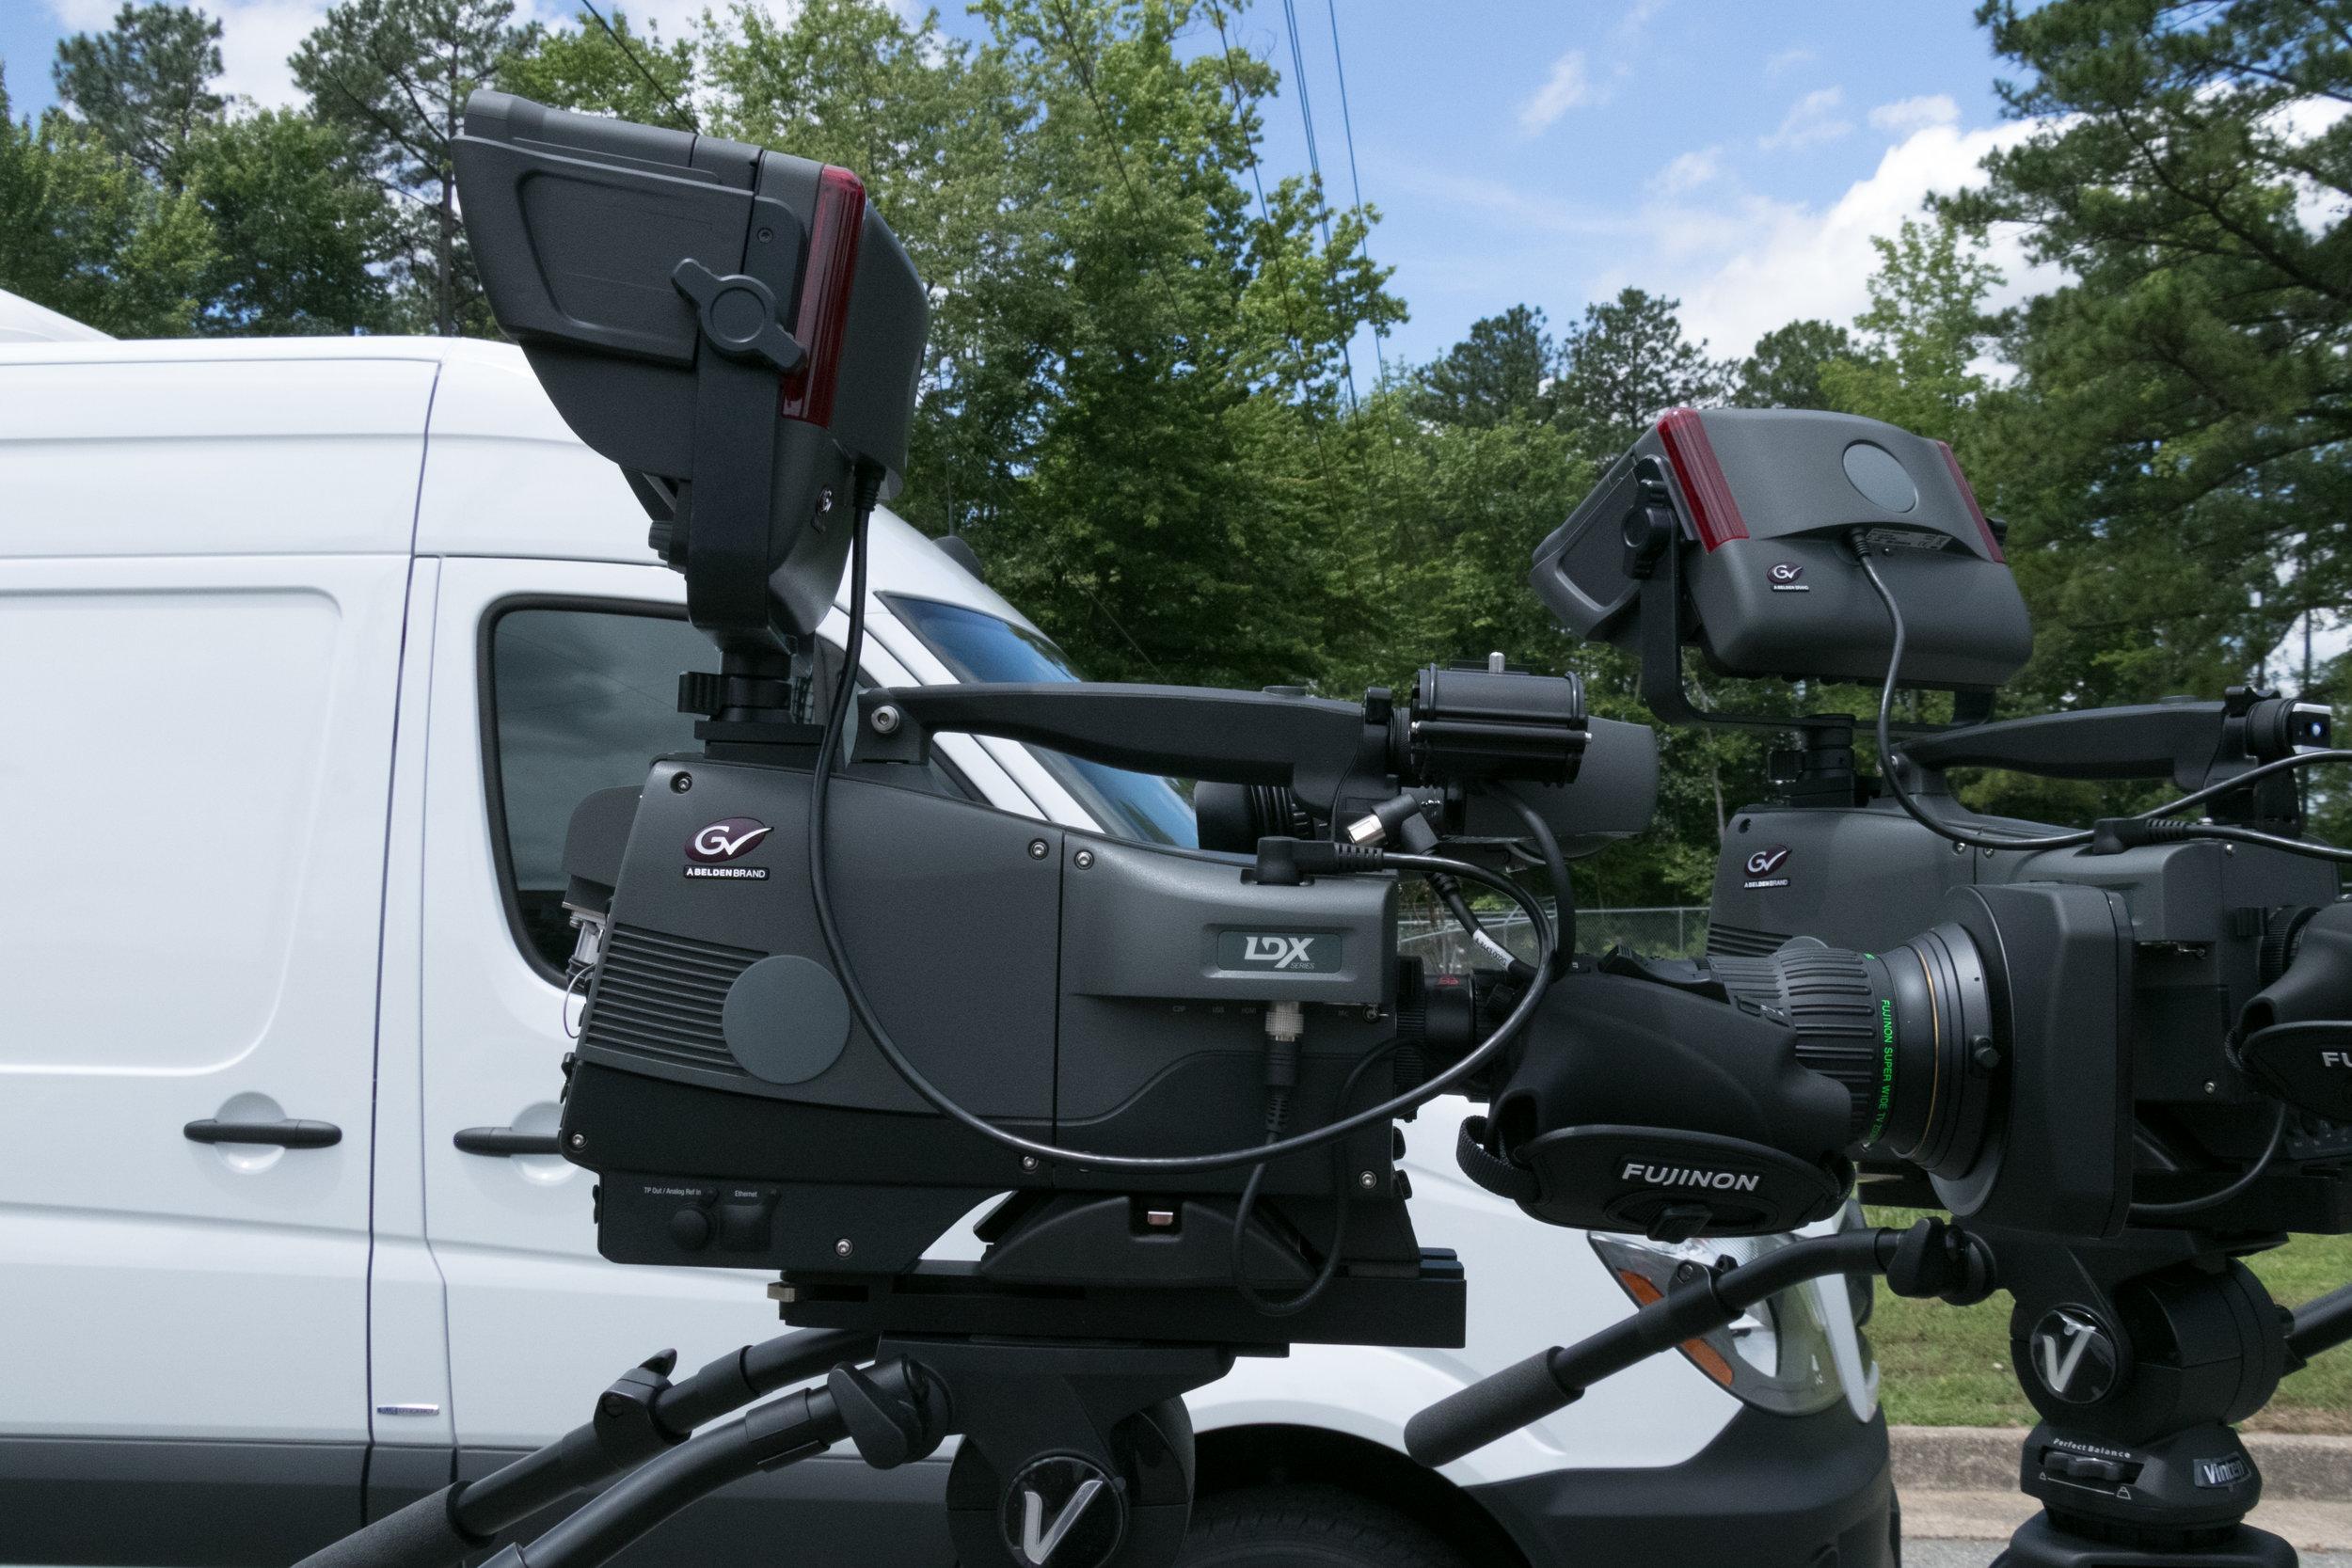 Grass Valley Cameras